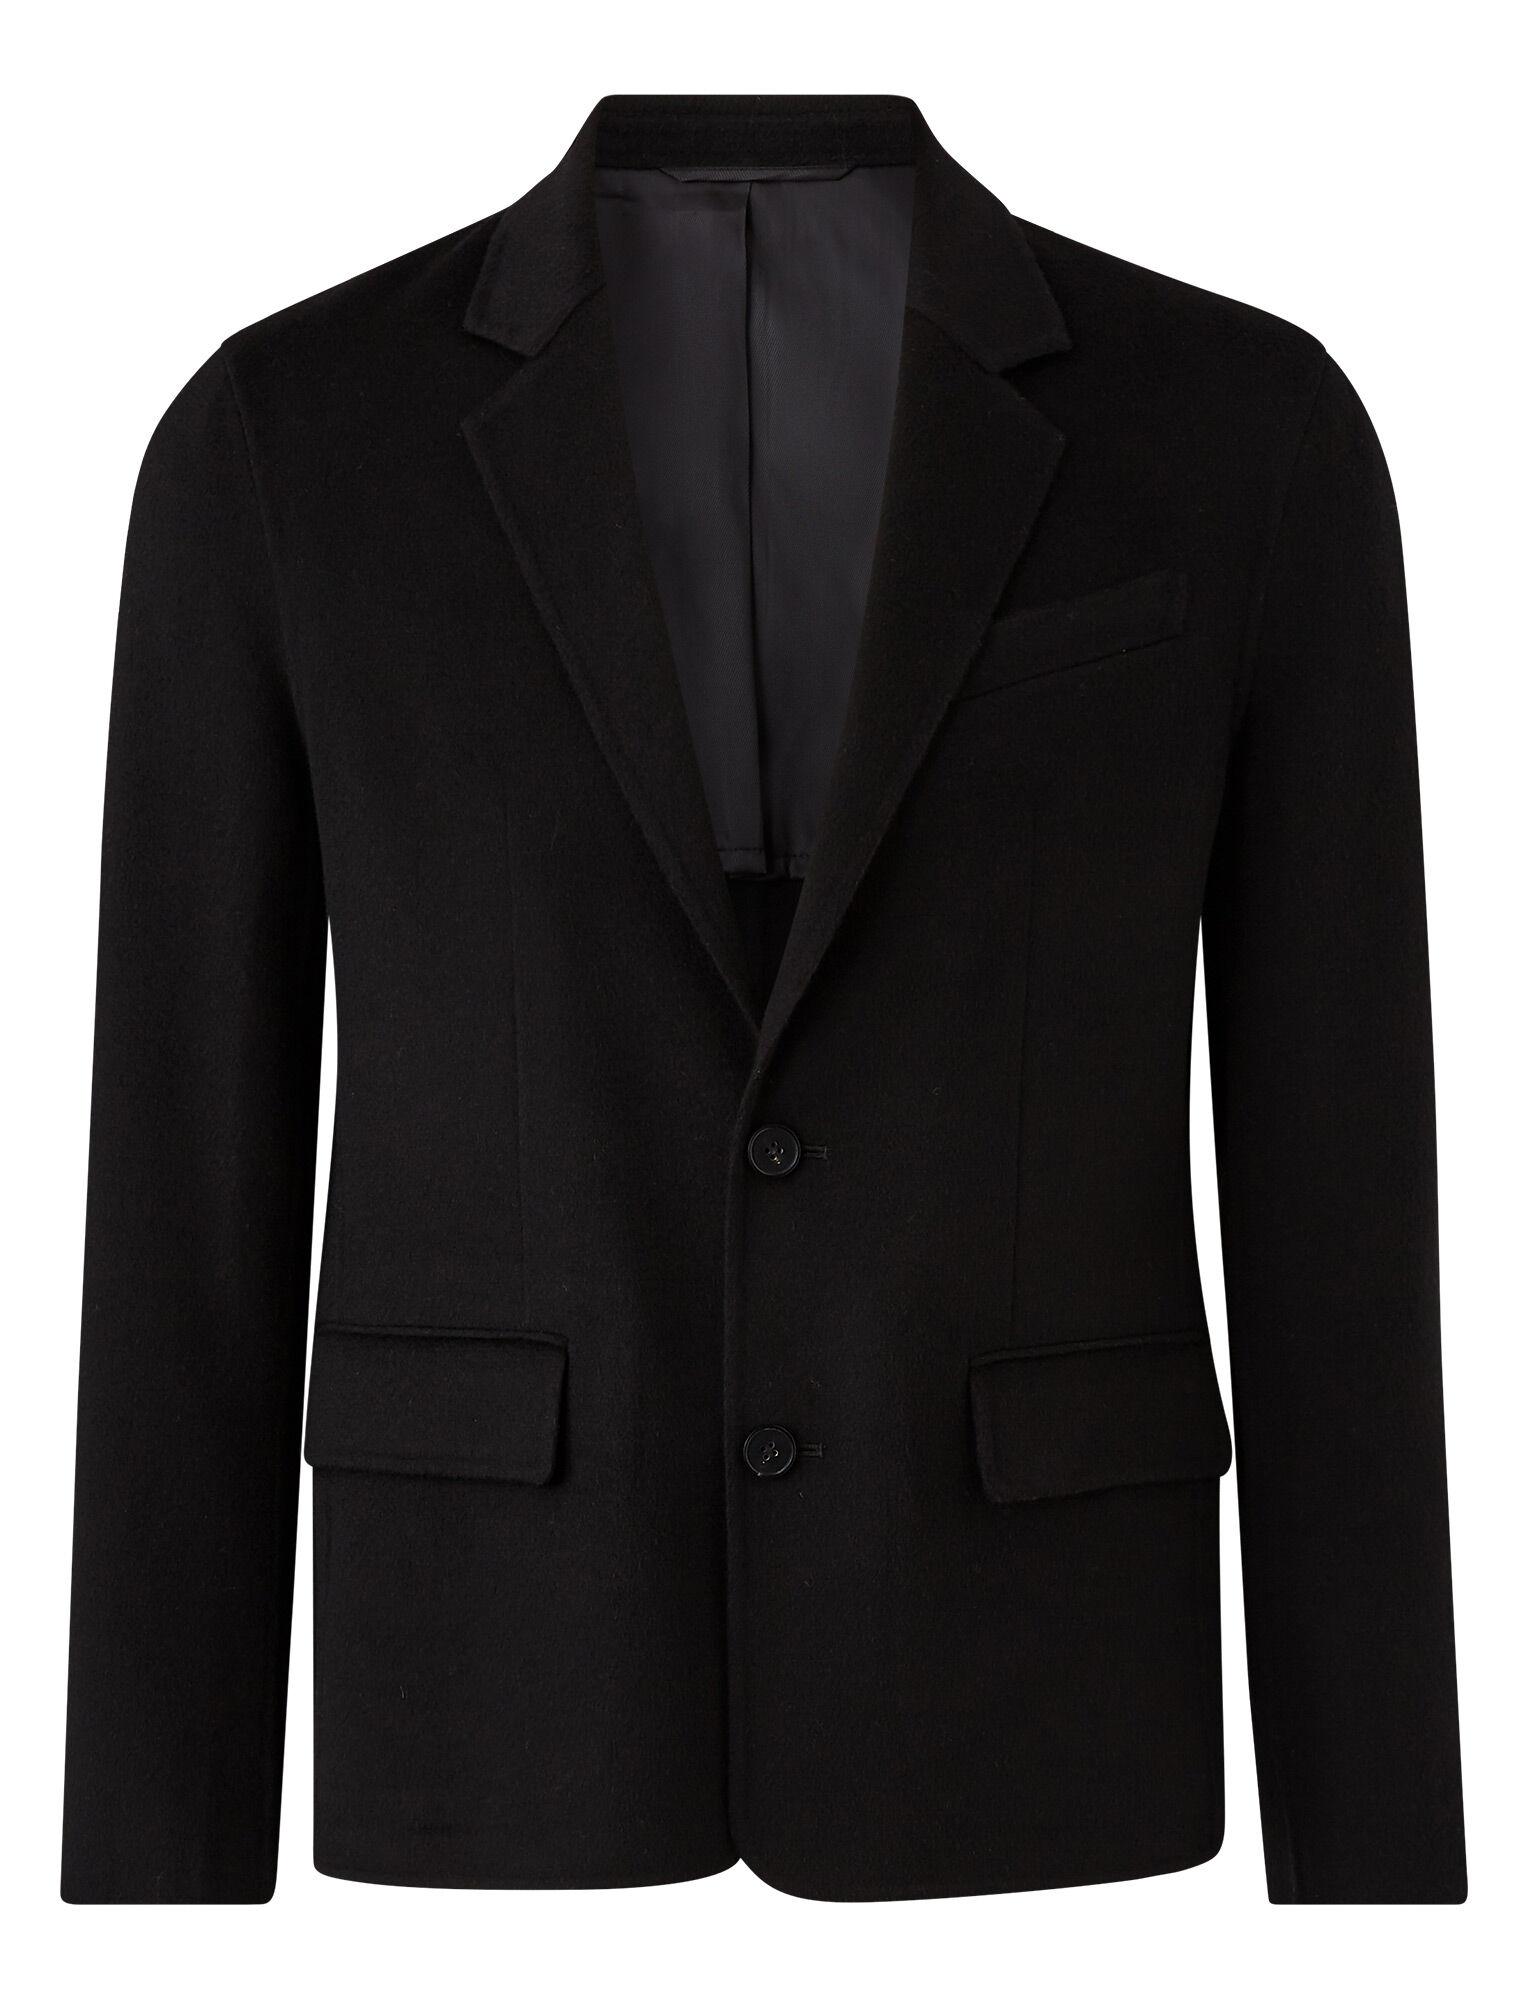 Joseph, Bernie Light Double Face Coat, in BLACK